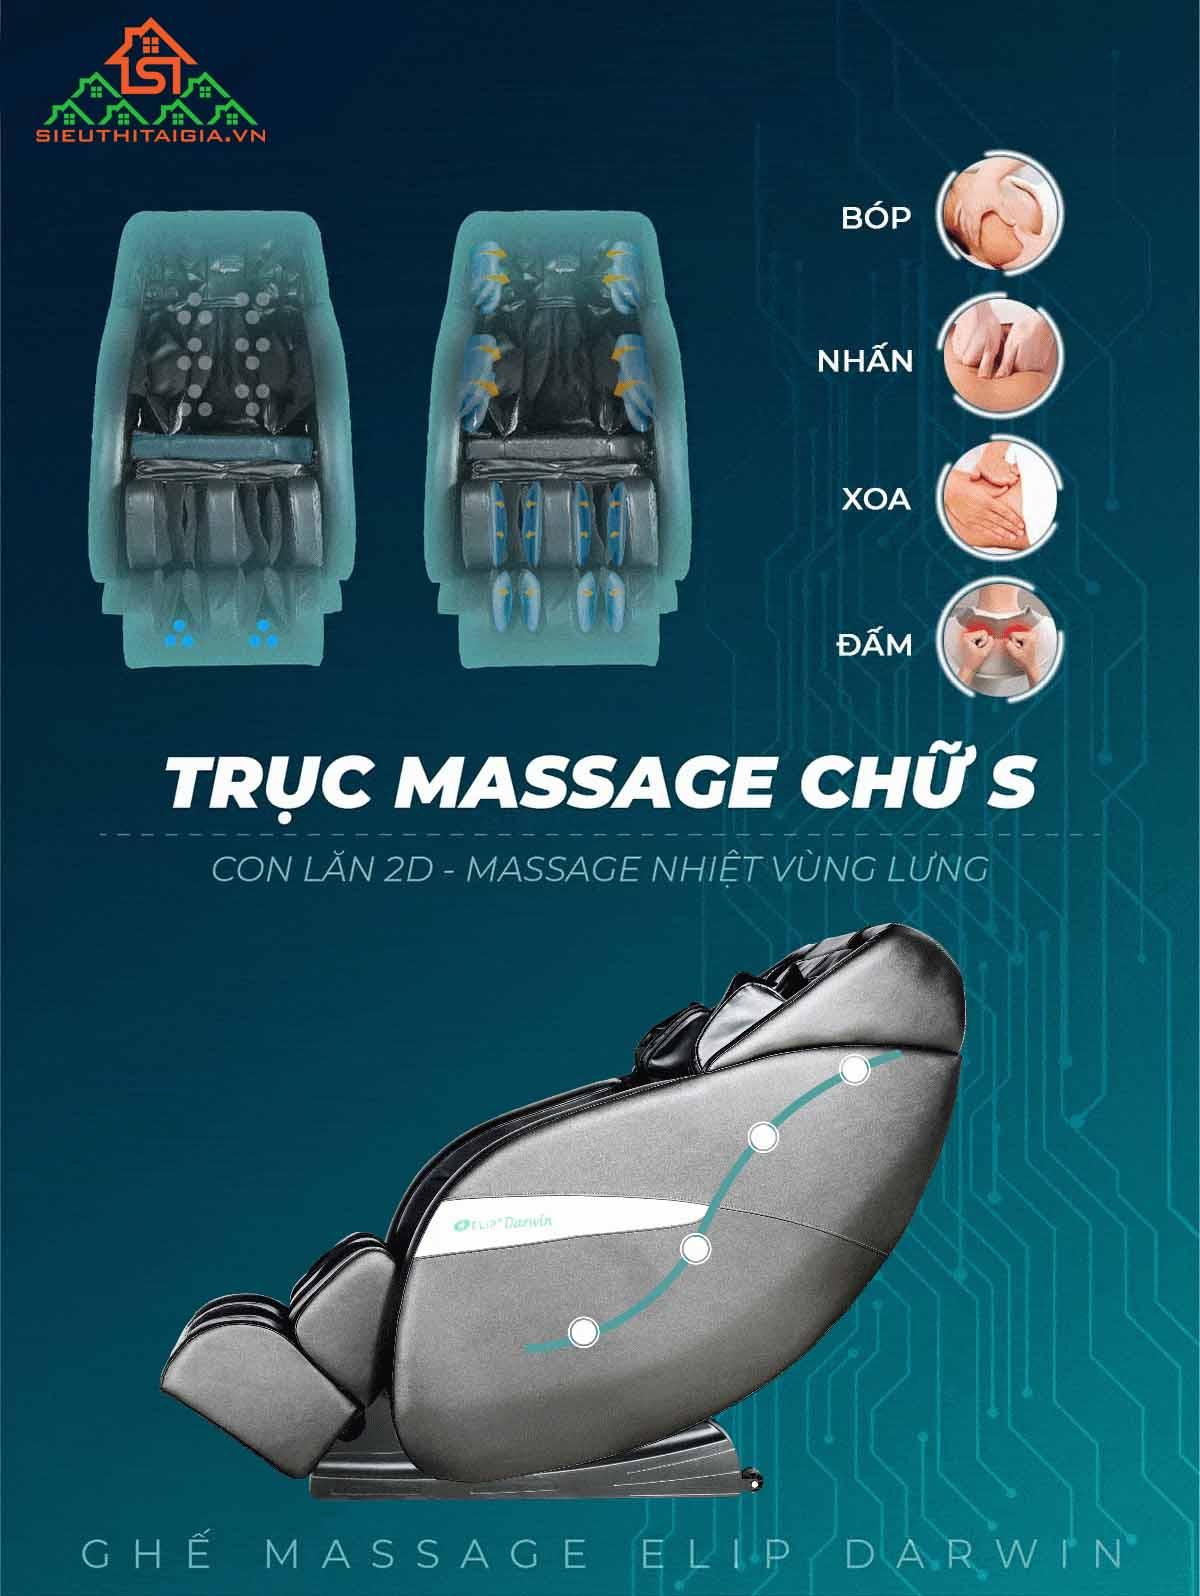 Ghế massage ELIP Darwin